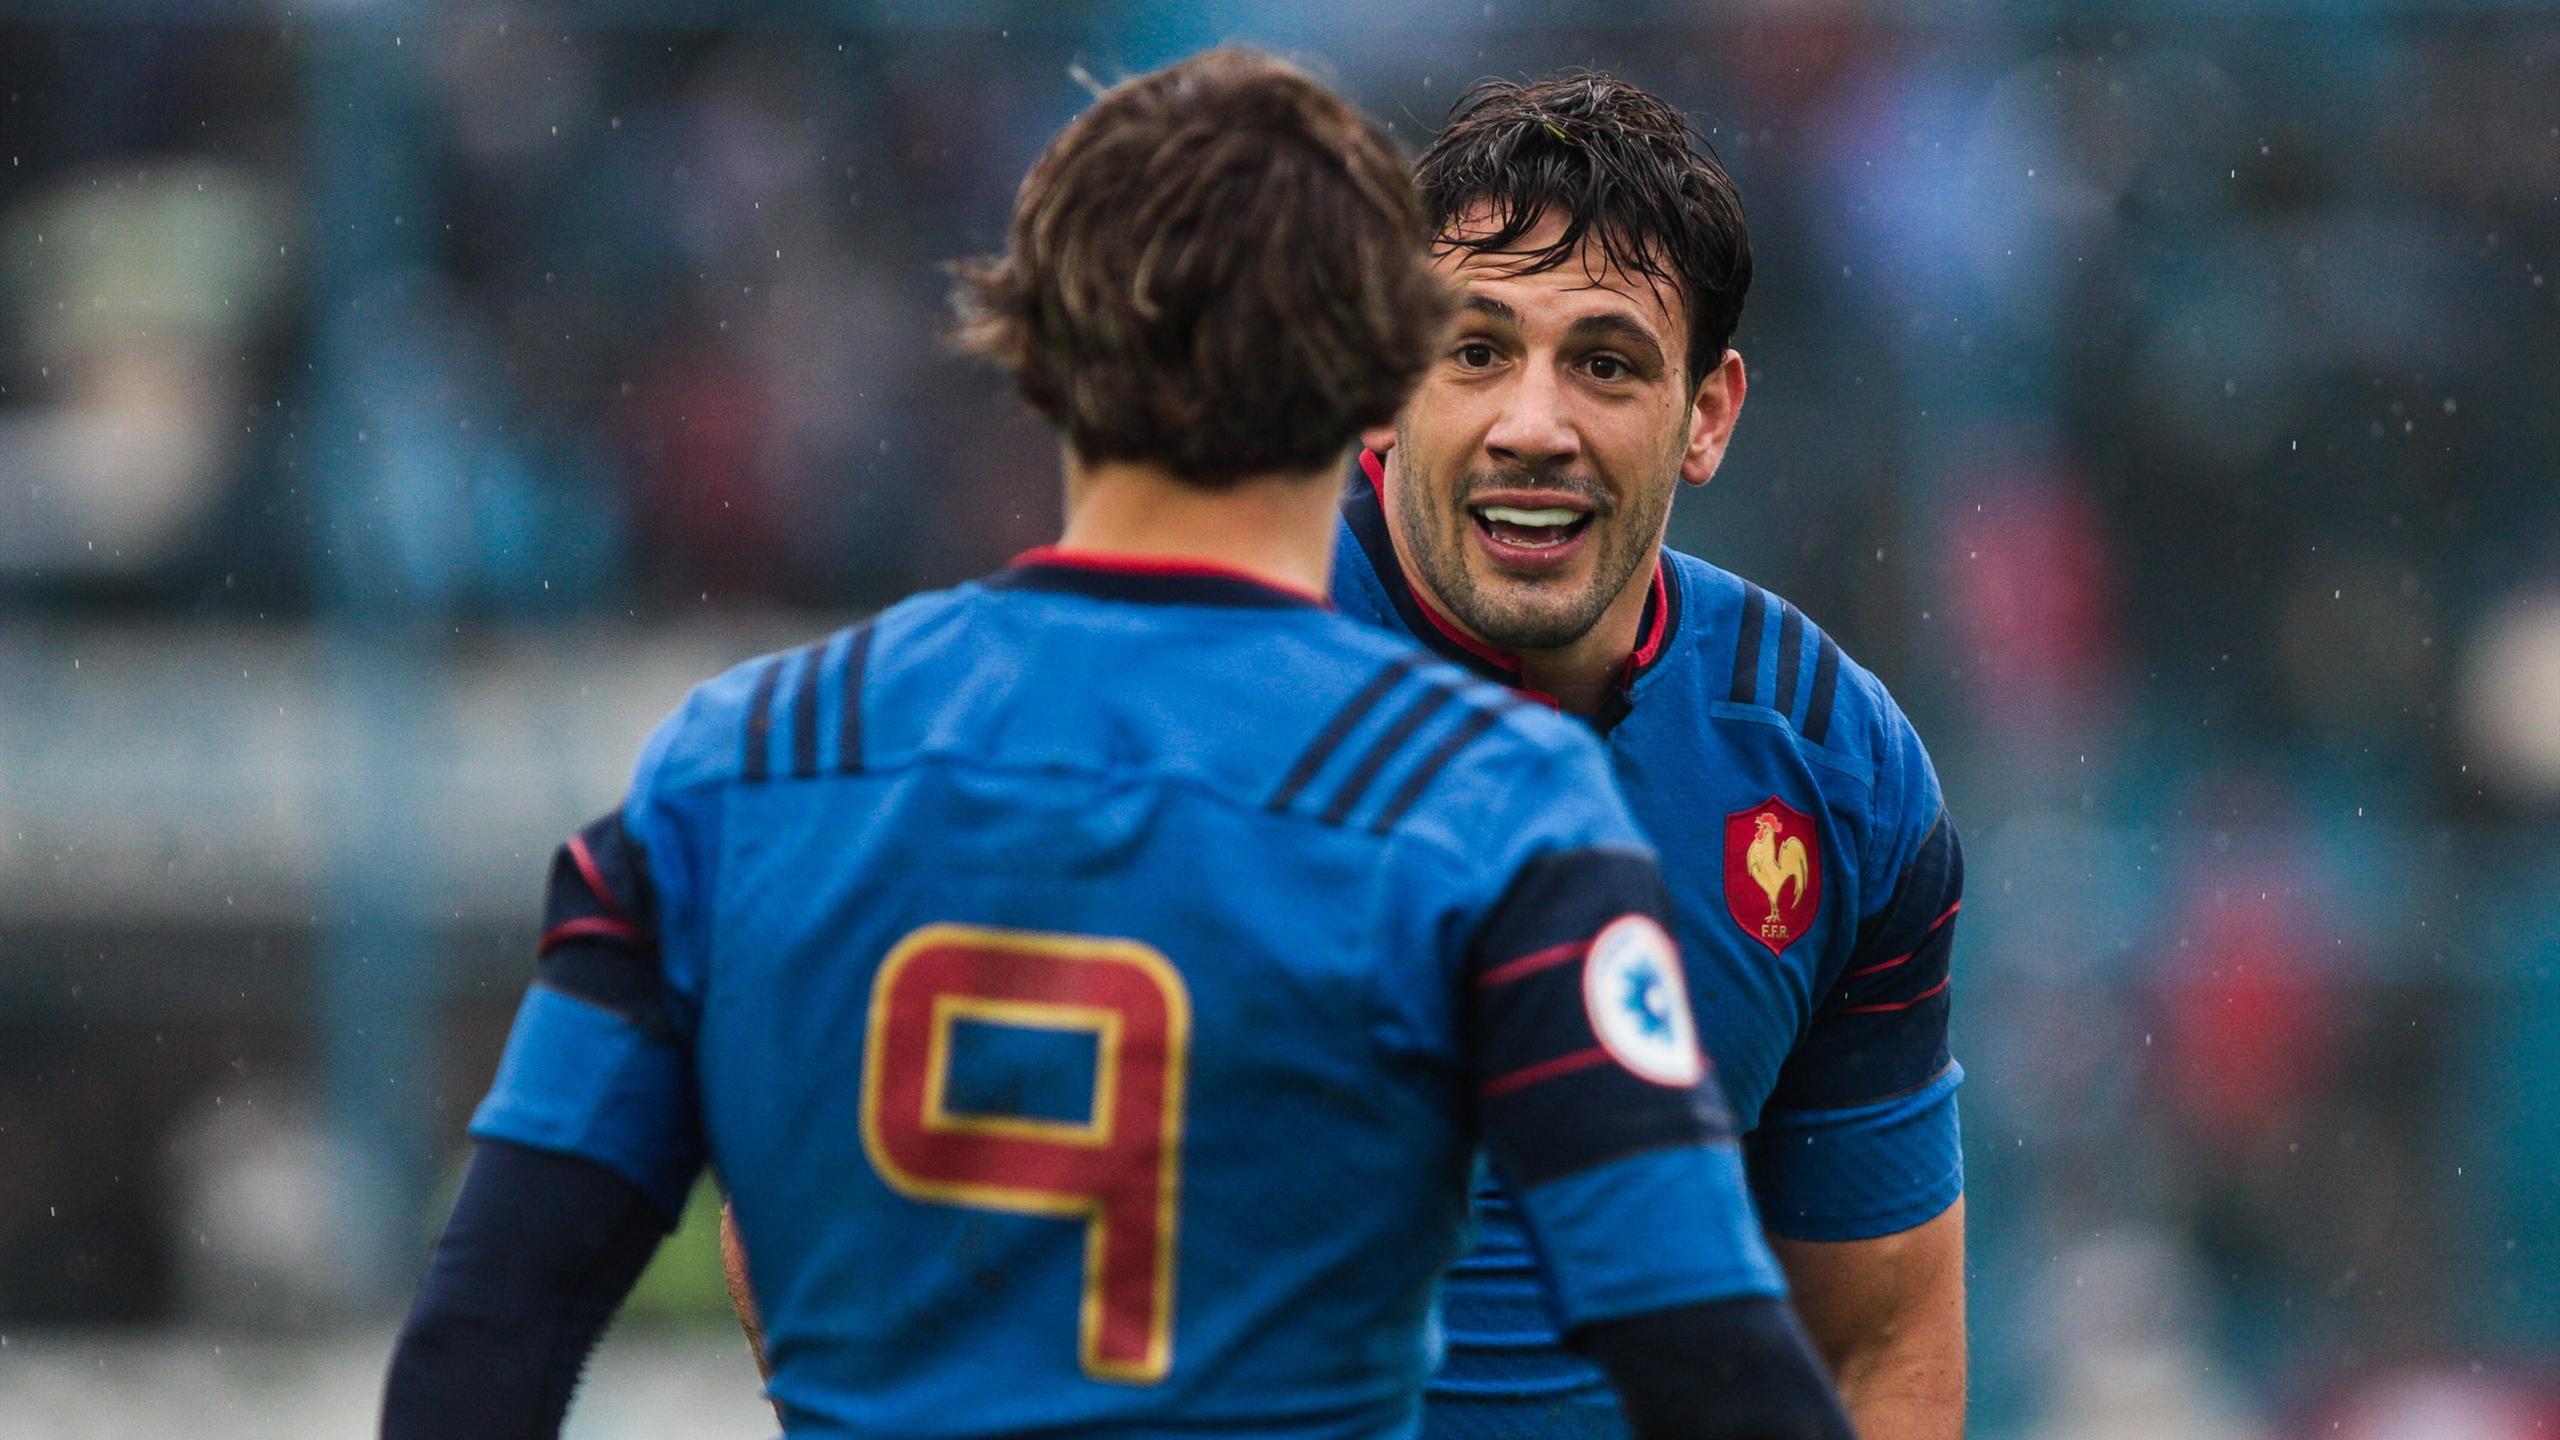 Rémi Lamerat et Baptiste Serin (XV de France) - 25 juin 2016